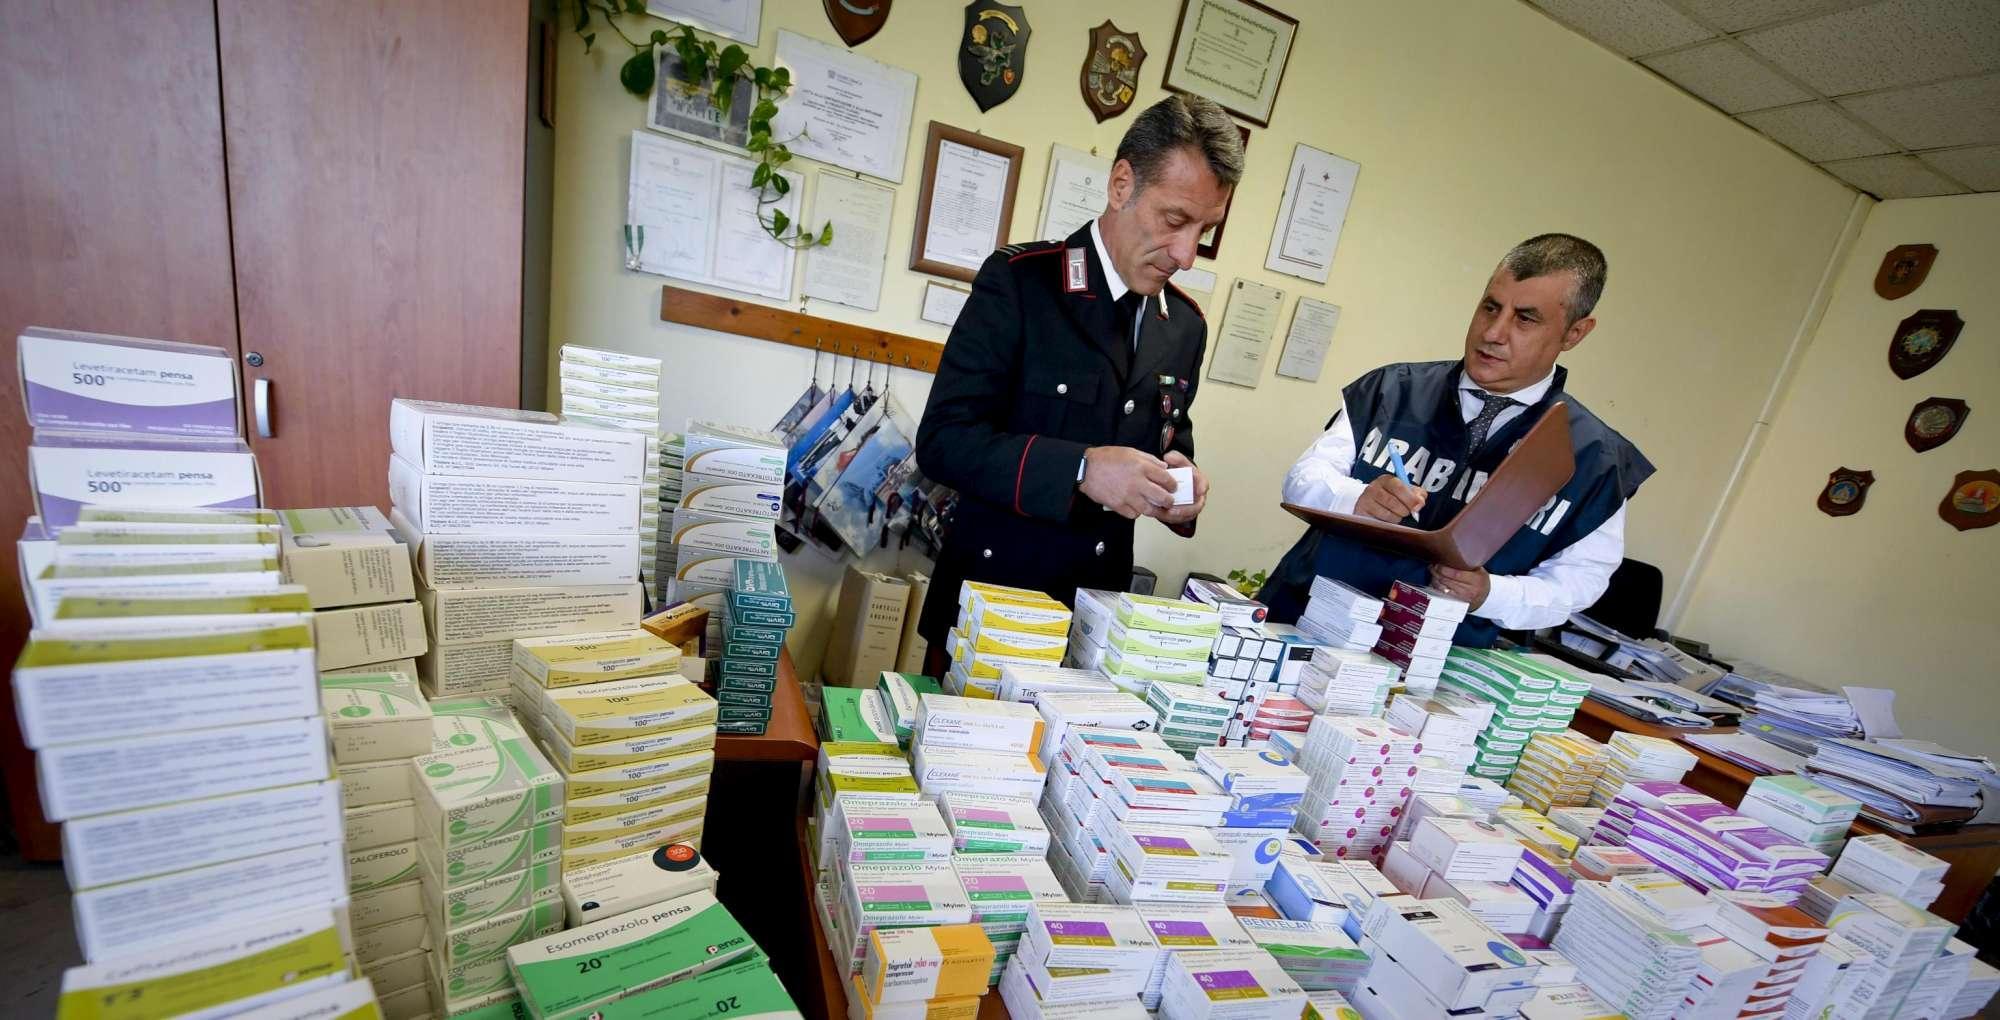 Napoli, scoperto mercato nero dei farmaci salva-vita